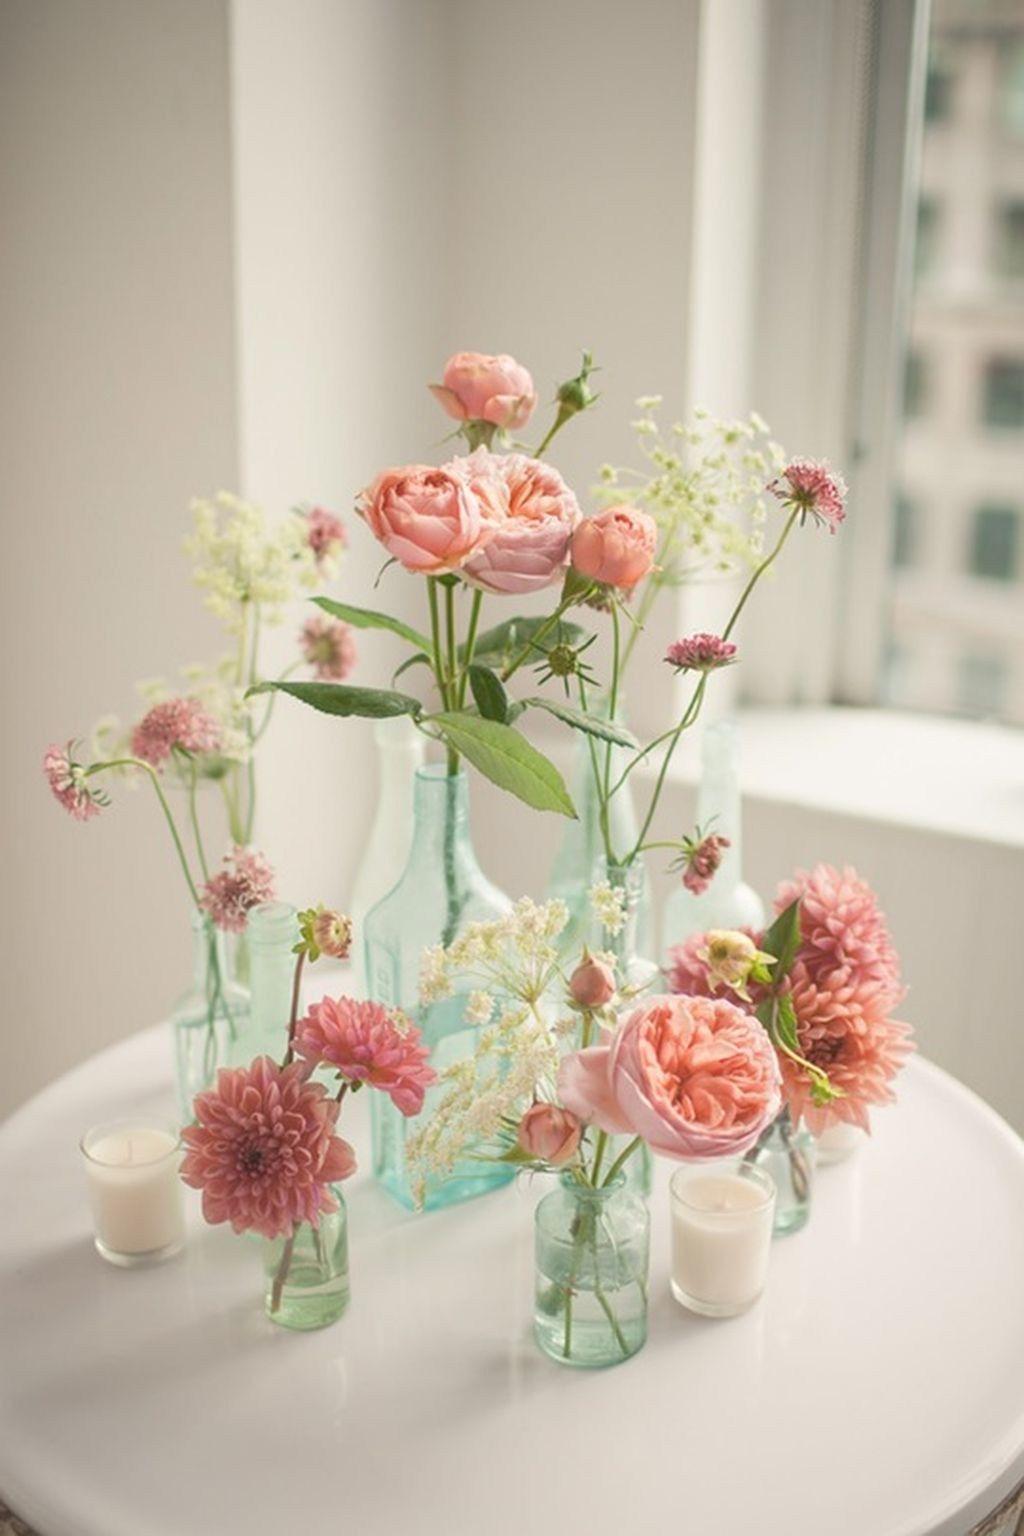 98 Simple Spring Wedding Centerpiece Ideas You Will Love